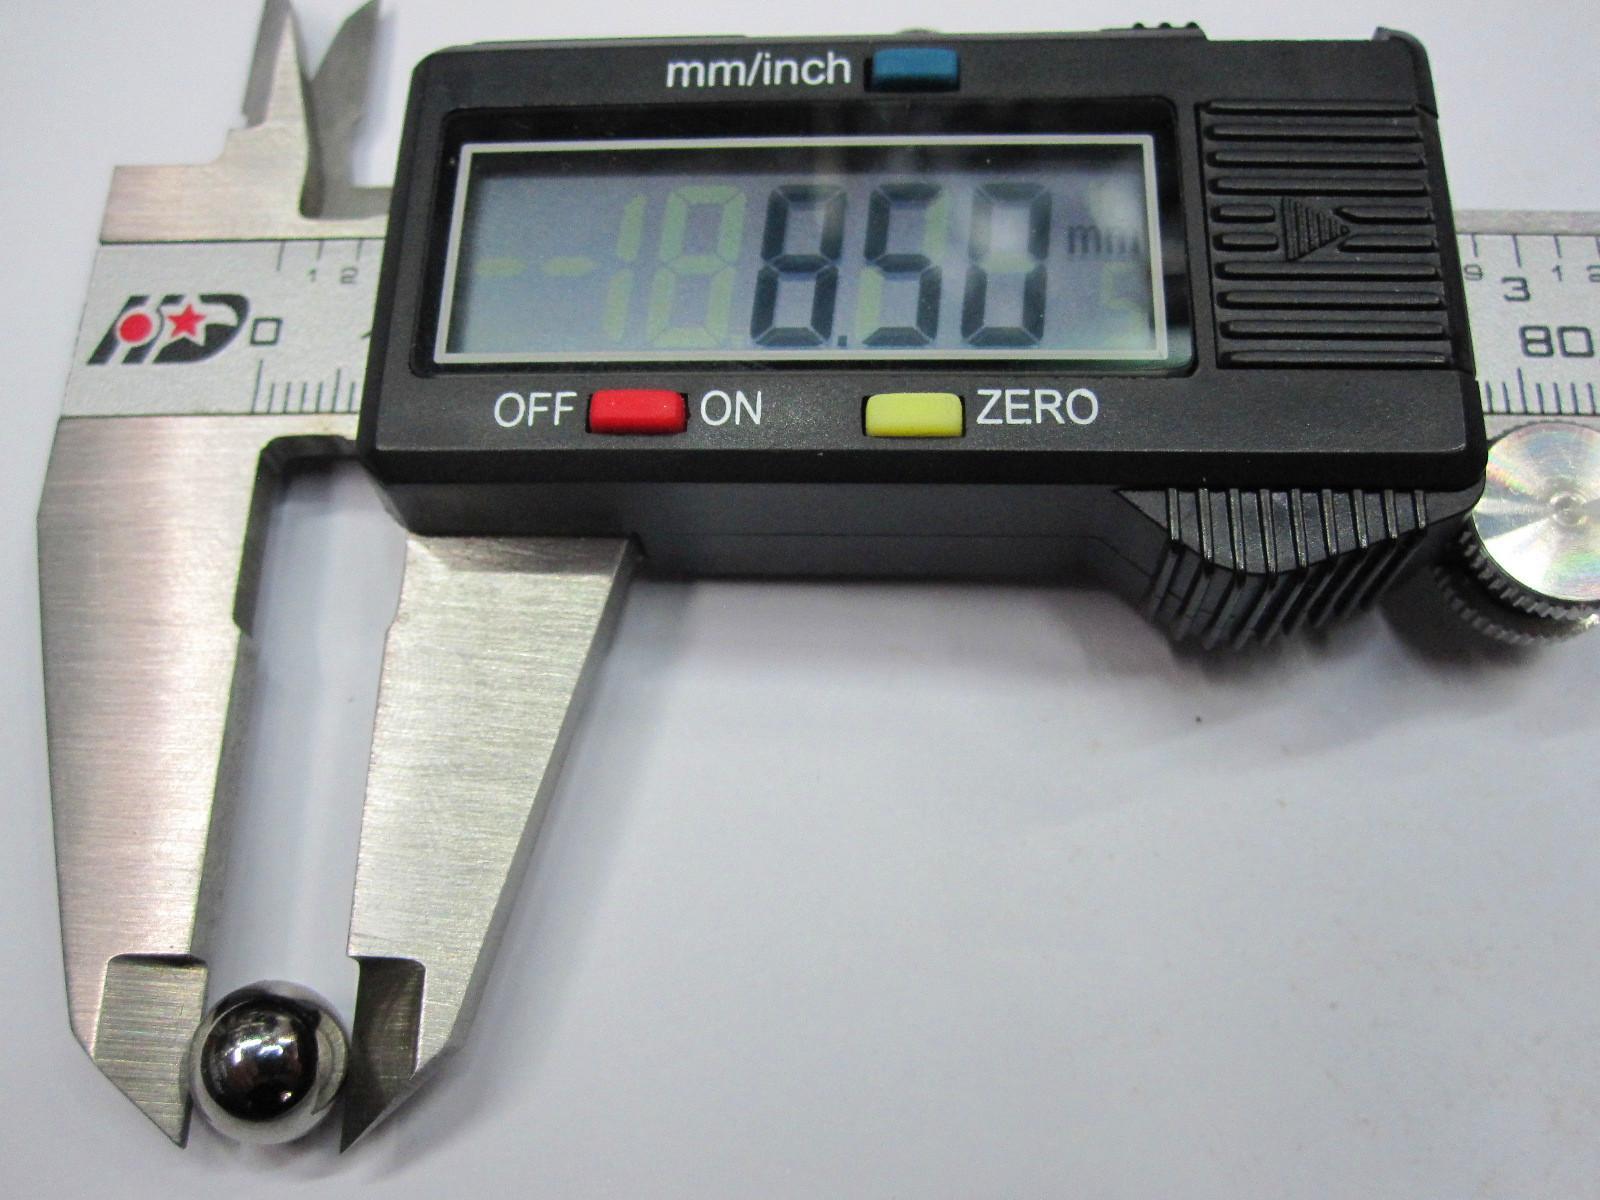 8,5 8.5 mm Rodamiento de bolas Bola de acero Diámetro de bola 8.5mm 10pcs / set Precisión: G10-Grade 8.5mm